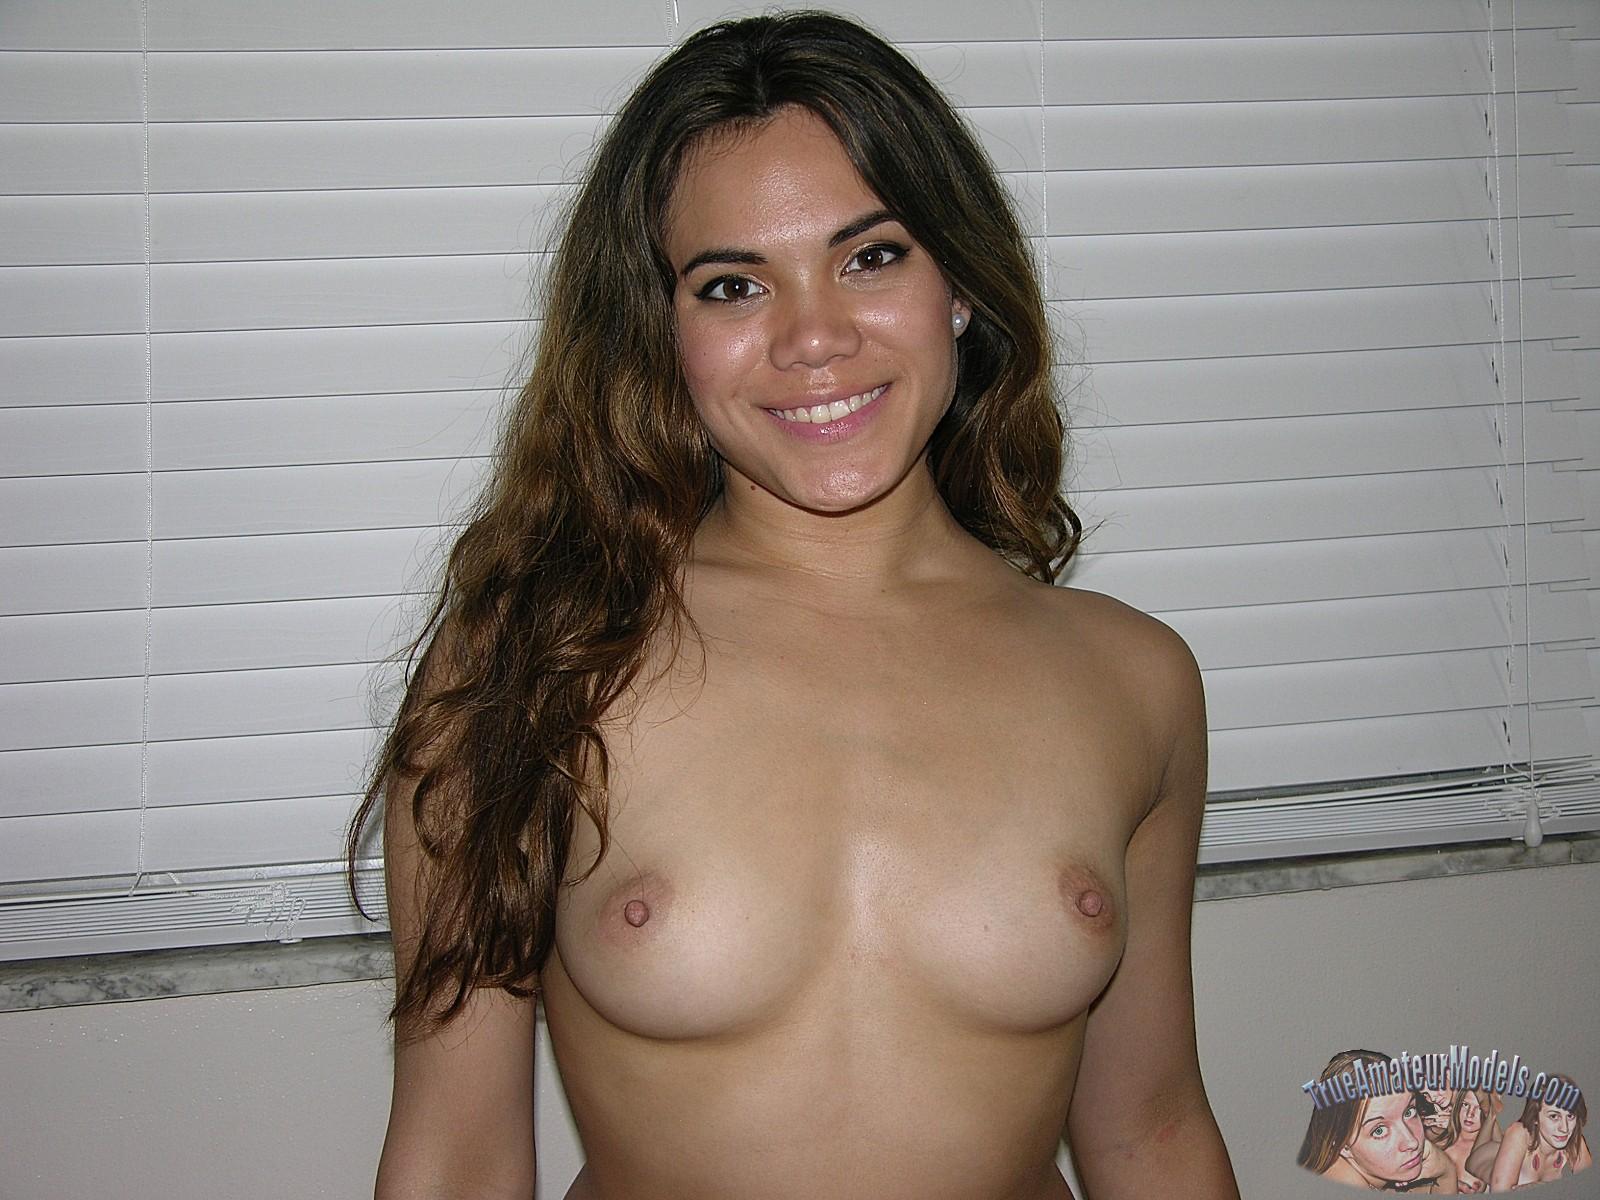 Amateur Hispanic Modelmodels On Nude